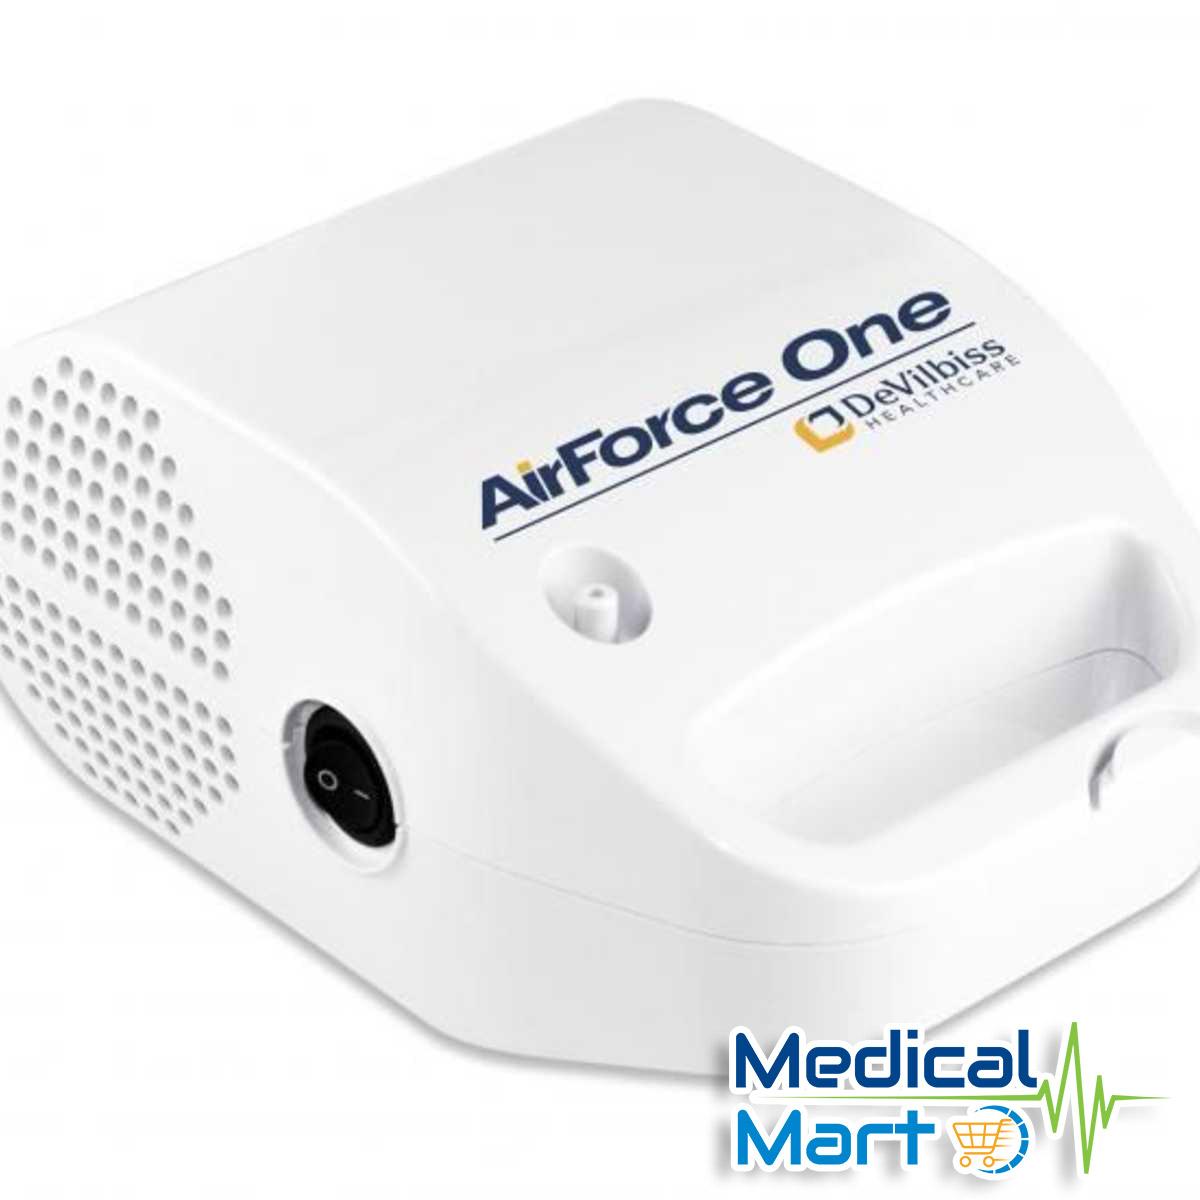 Airforce One Nebulizer